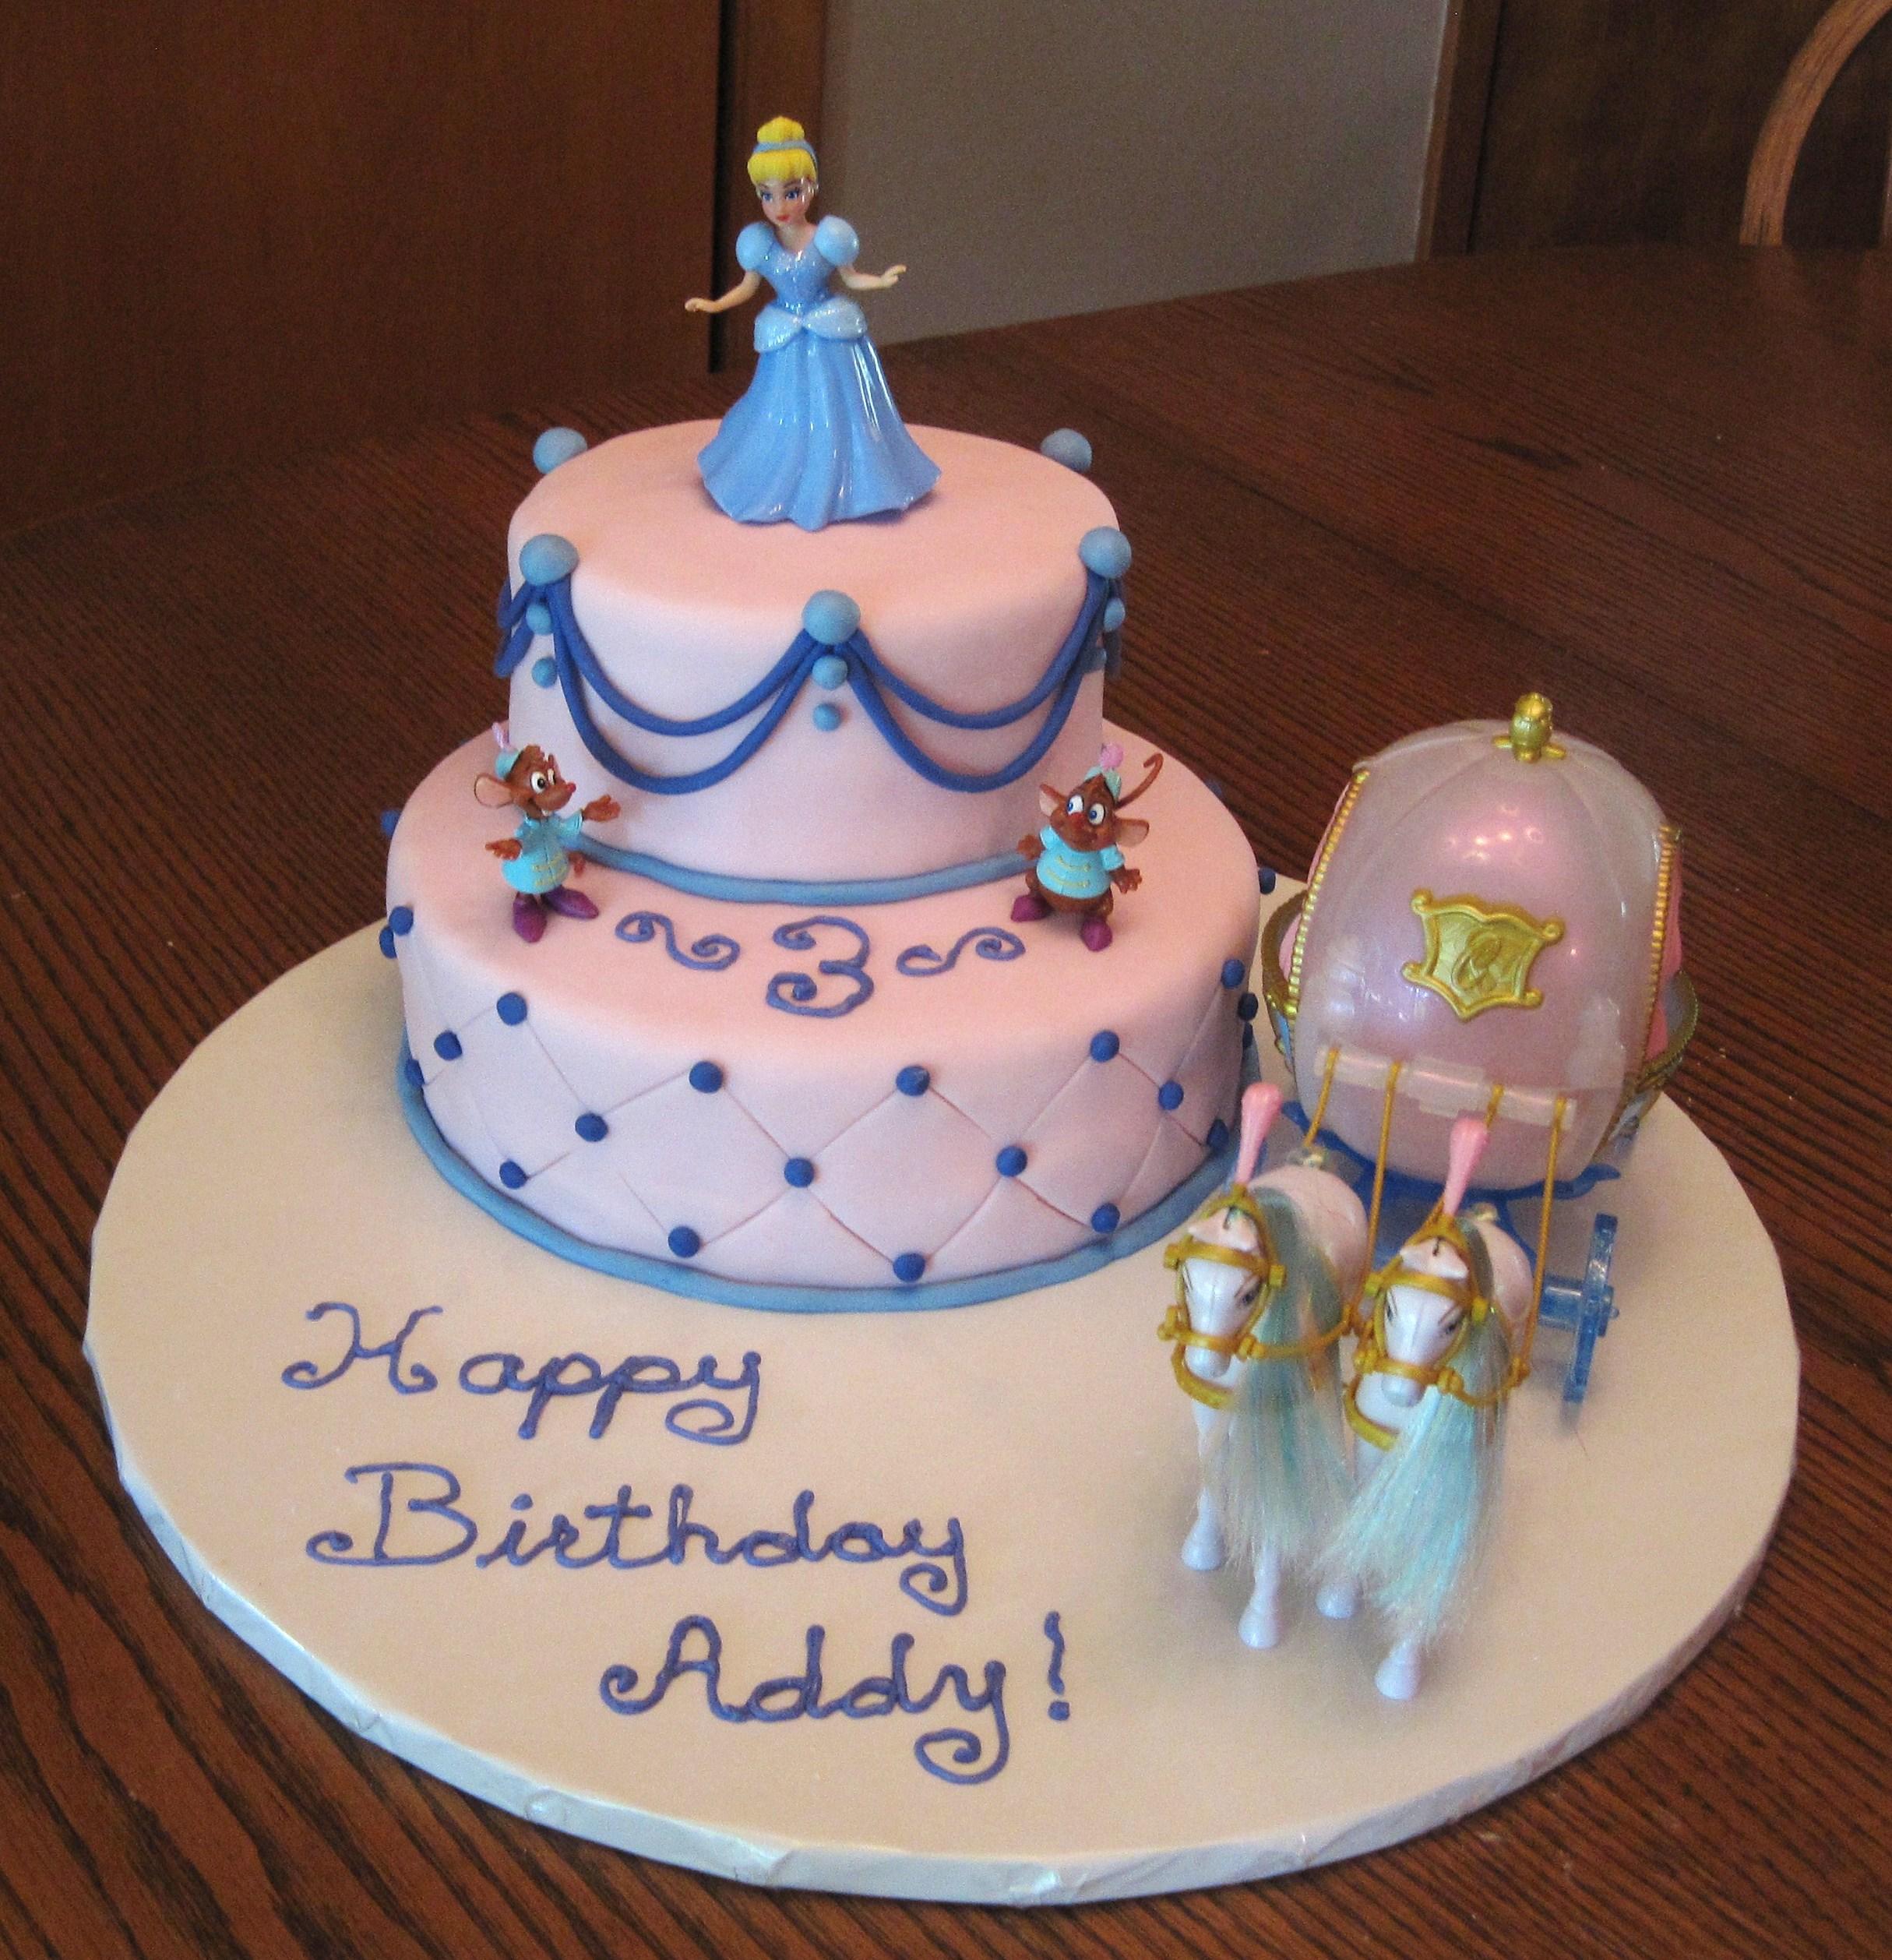 Admirable 11 Cinderella Bday Cakes Photo Cinderella Birthday Cake Personalised Birthday Cards Petedlily Jamesorg